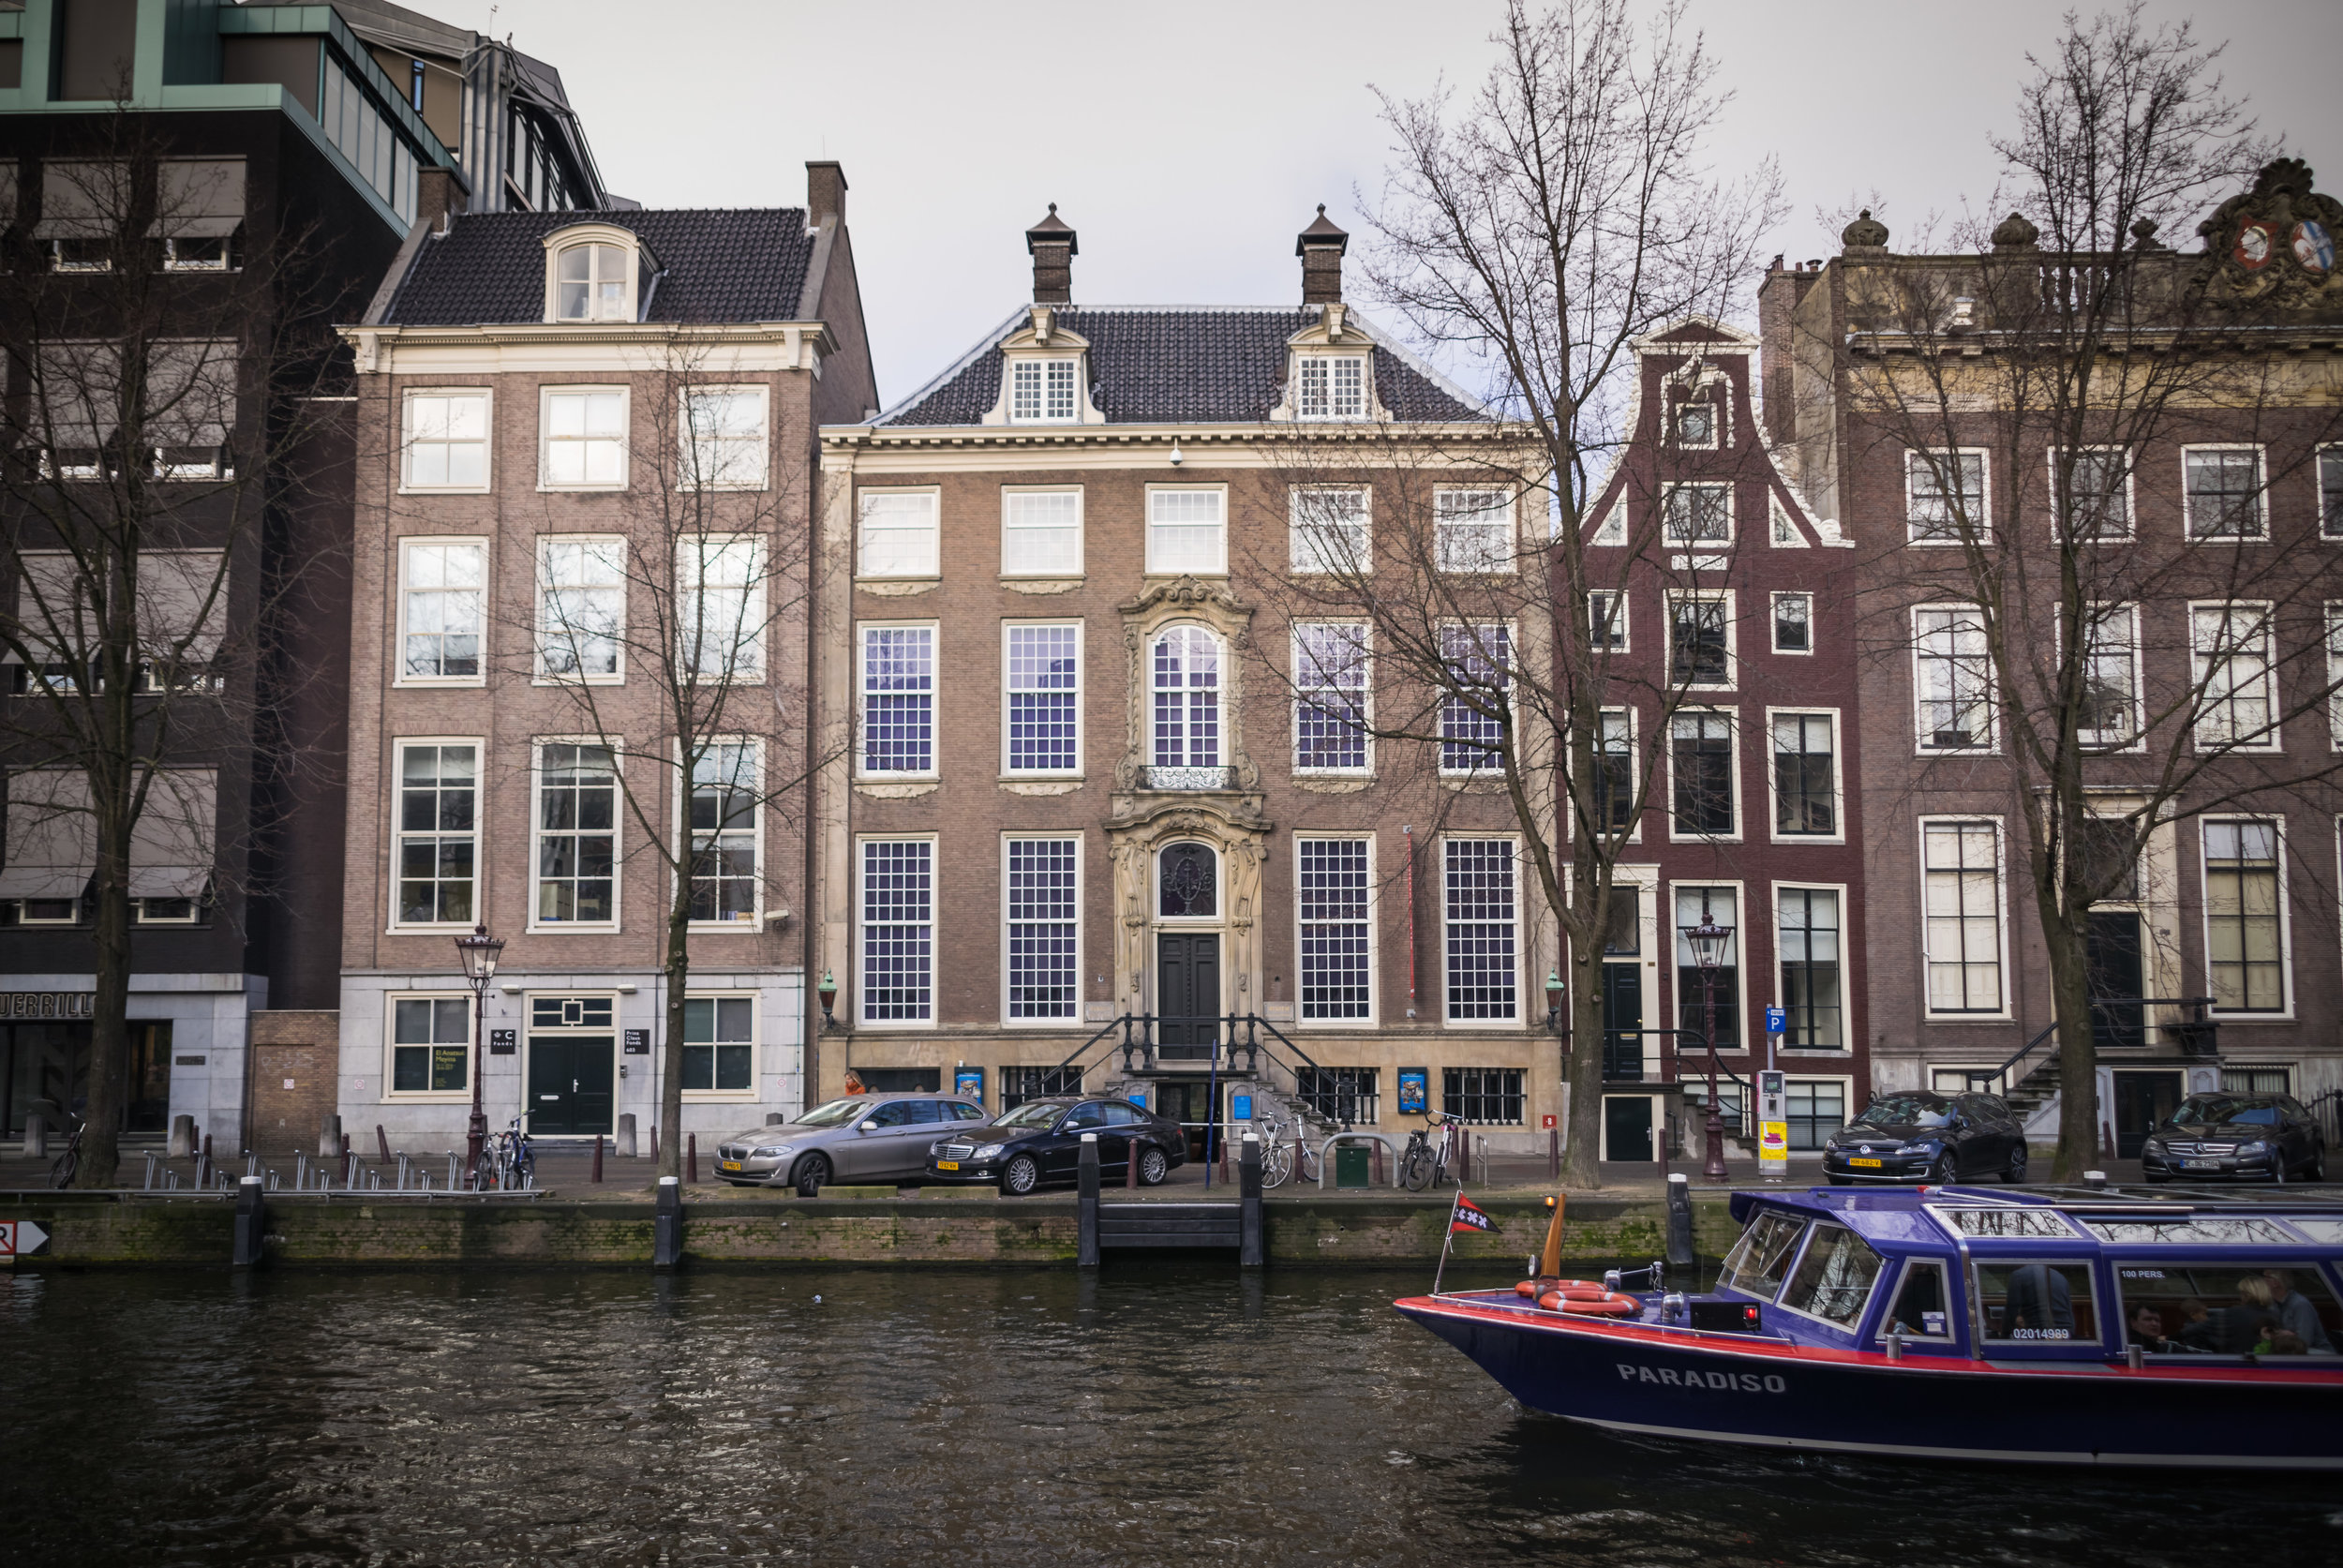 Netherlands_Museum+Willet-Holthuysen-1.jpg